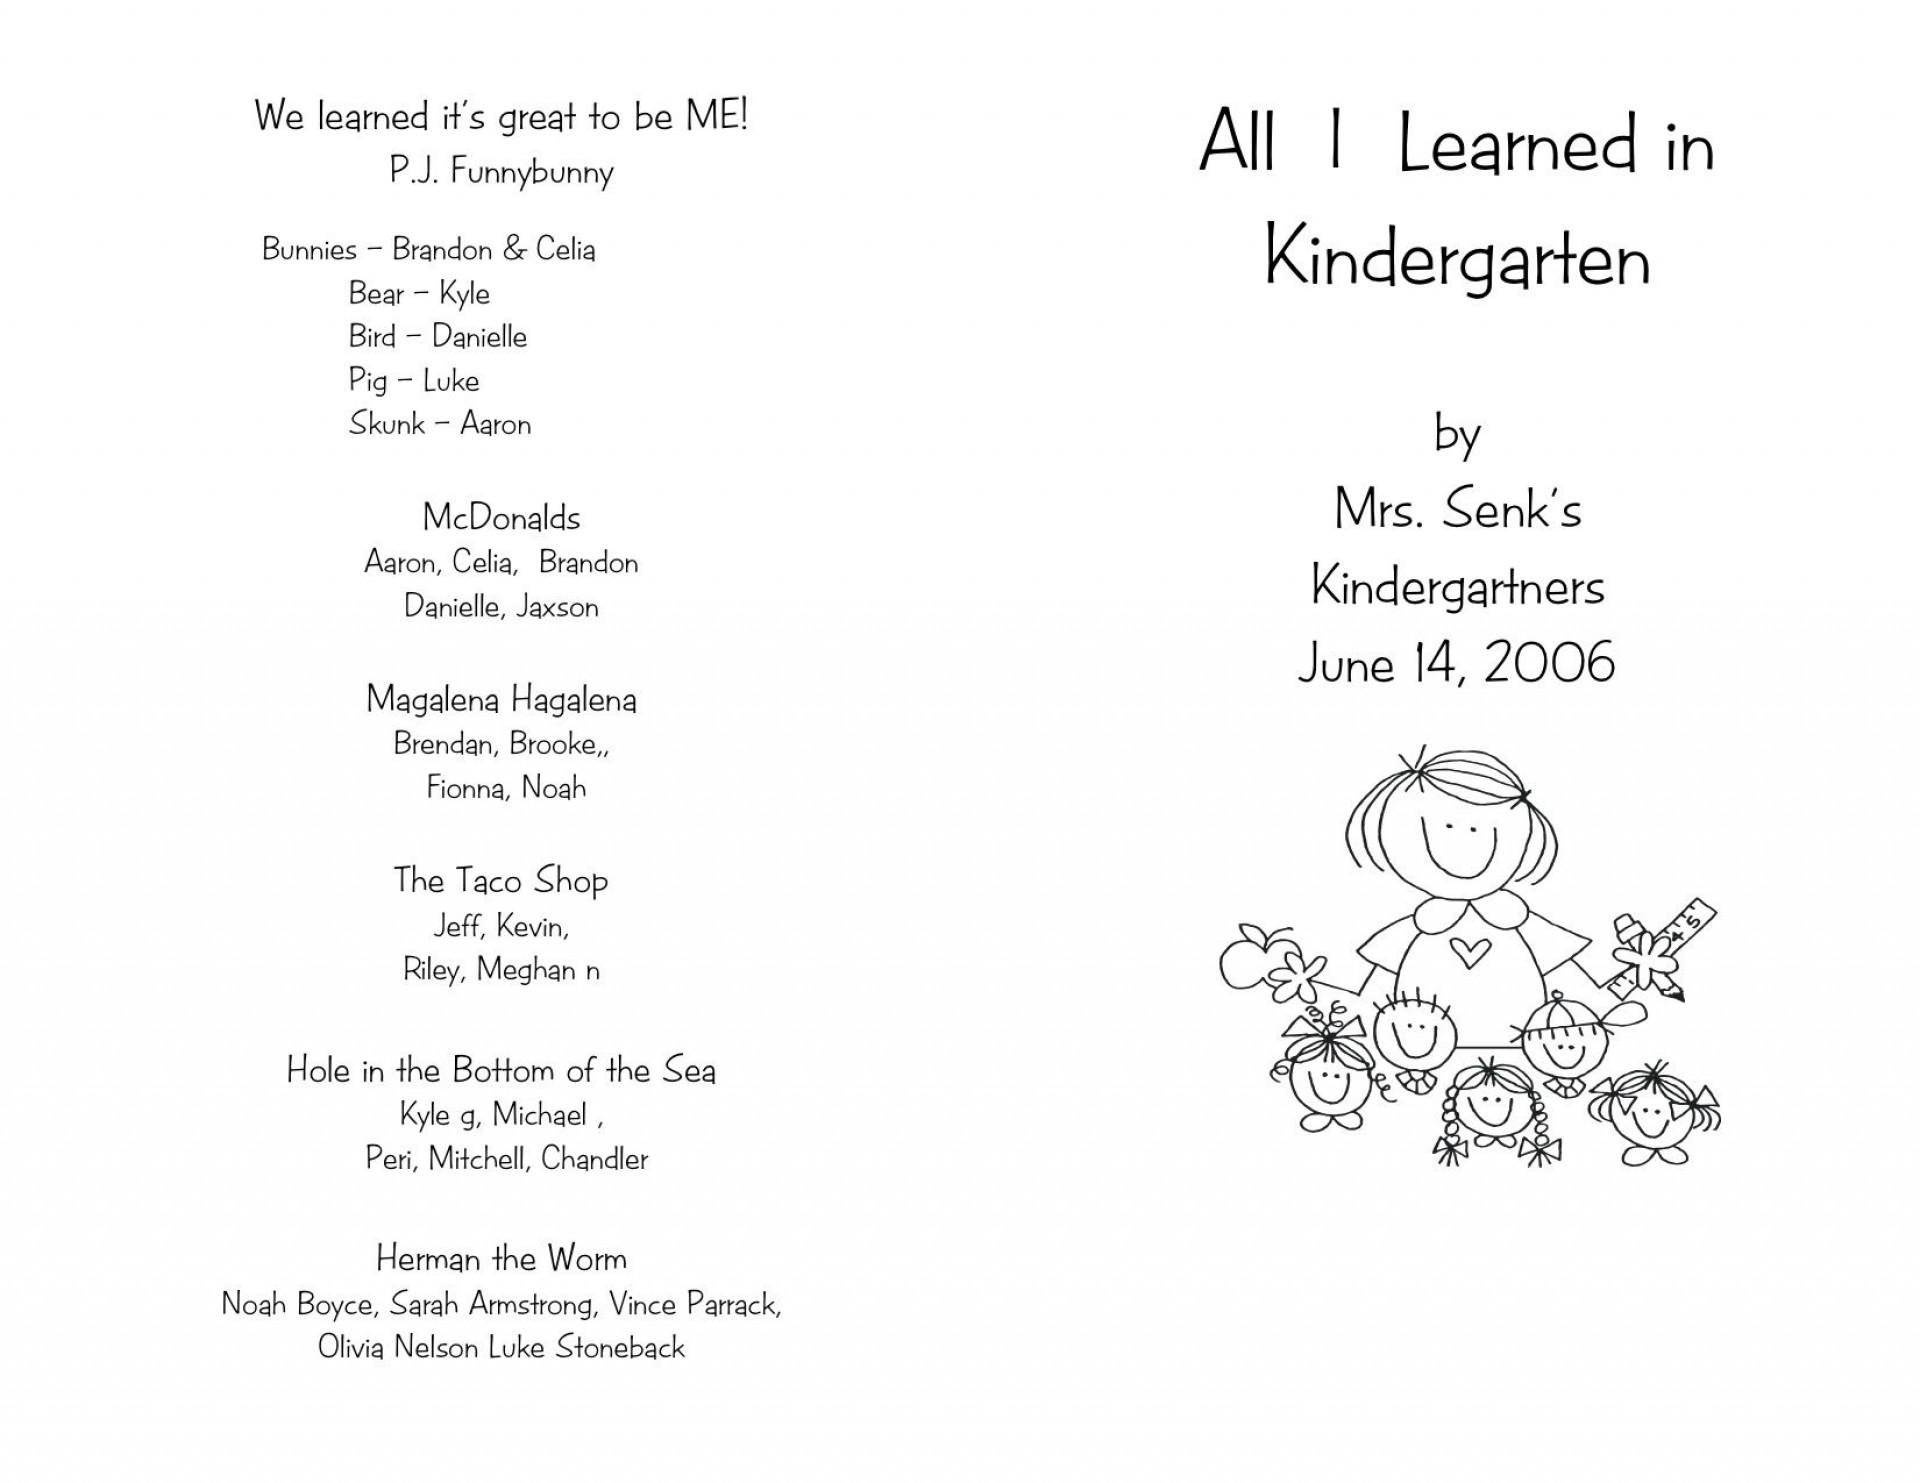 006 Remarkable Preschool Graduation Program Template High Def  Templates Free Printable Pdf1920